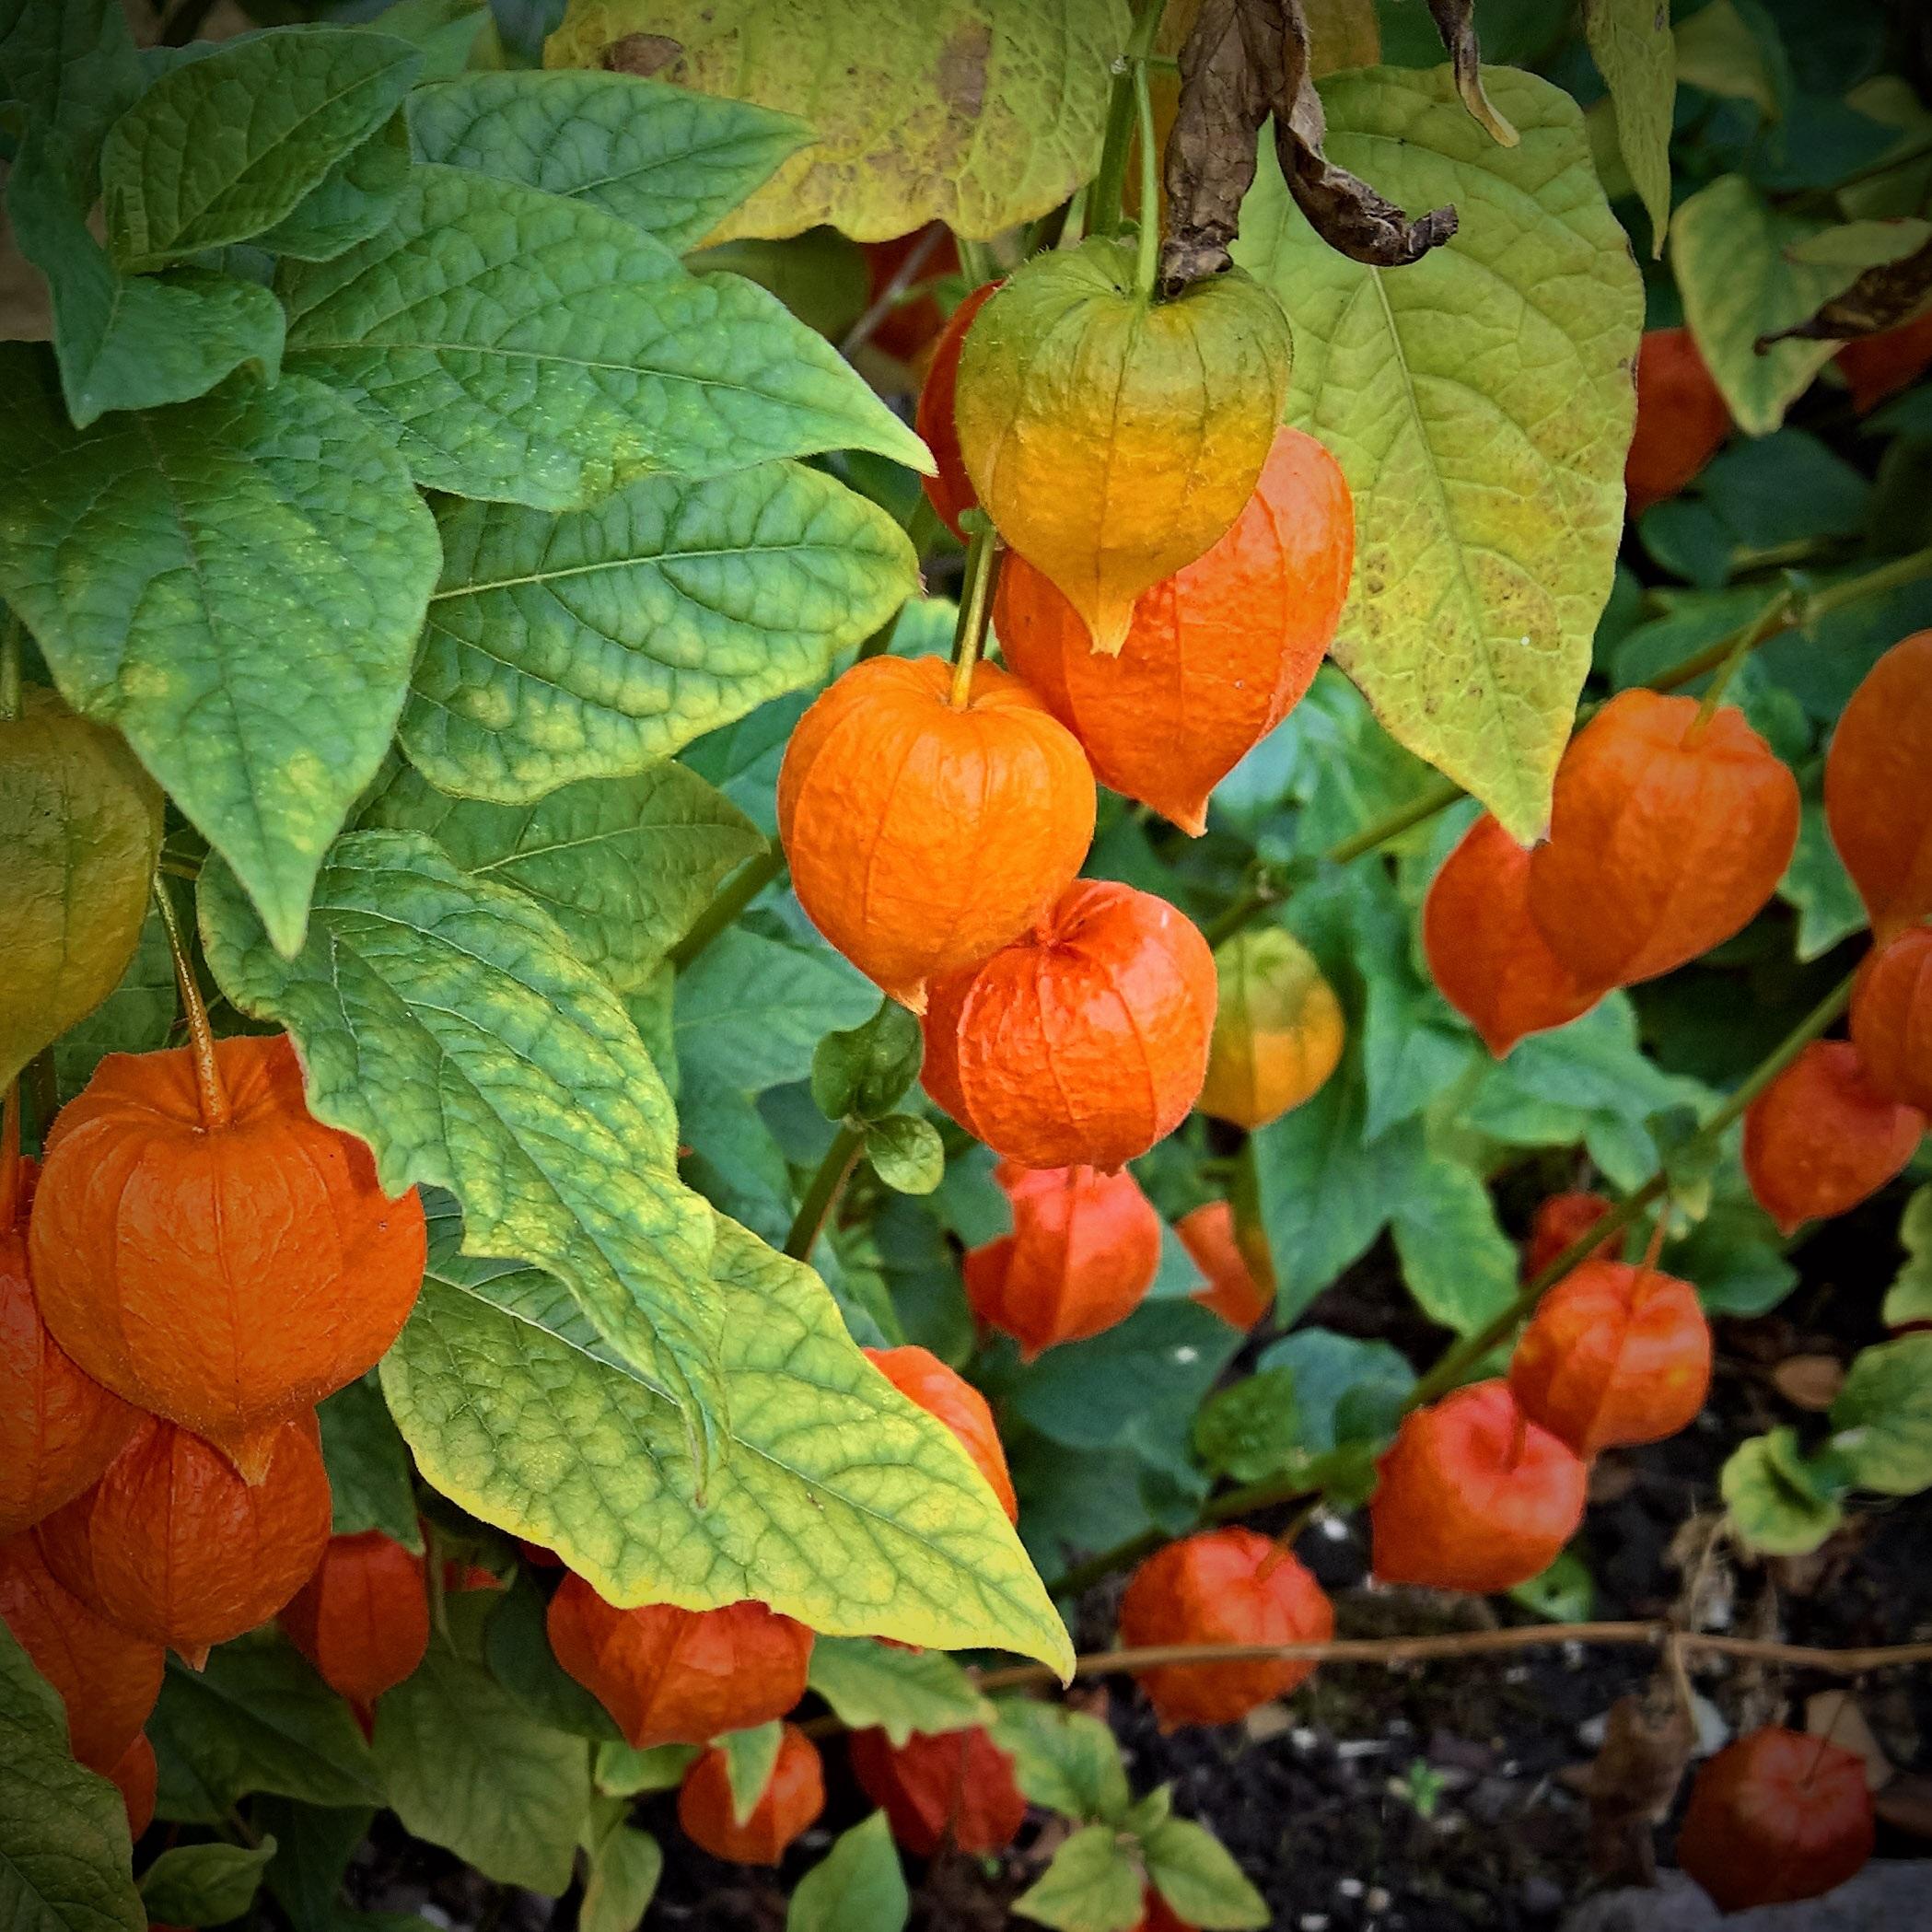 Fotos gratis : naturaleza, Fruta, hoja, flor, comida, Produce ...